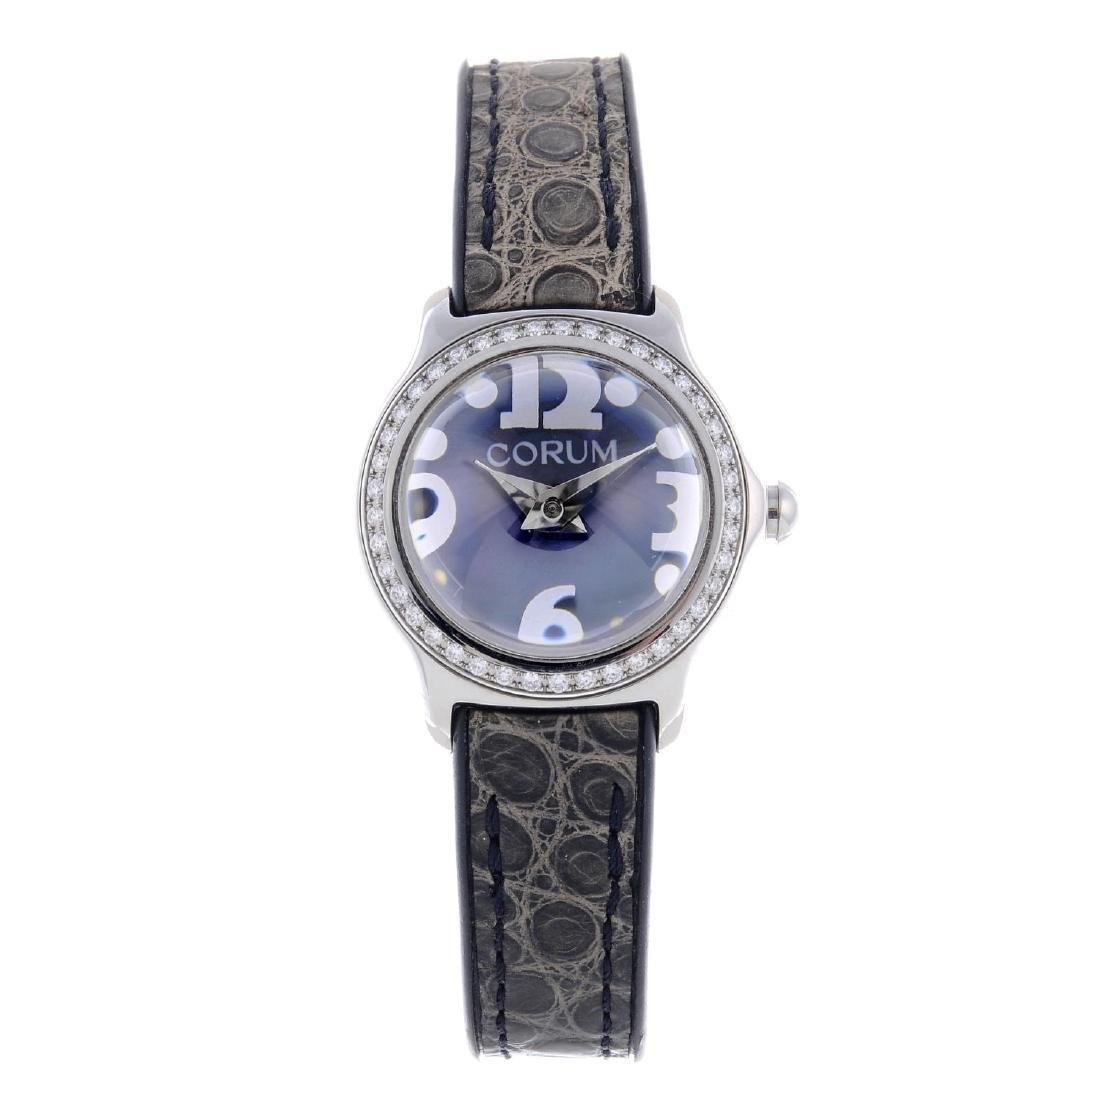 CORUM - a lady's Bubble wrist watch. Stainless steel